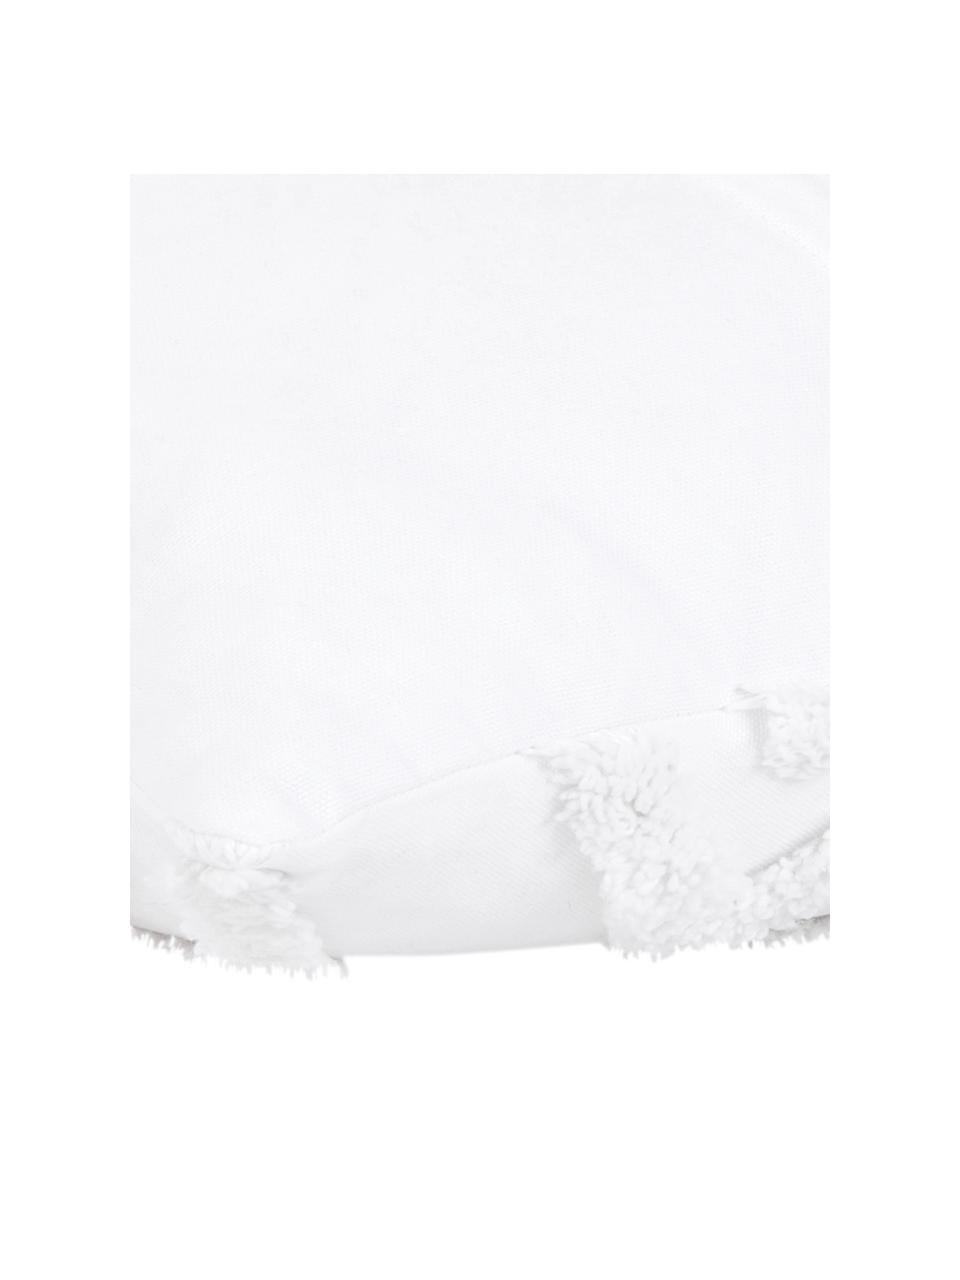 Kissenhülle Faye in Weiß mit getuftetem Muster, Webart: Panama, Weiß, 40 x 60 cm